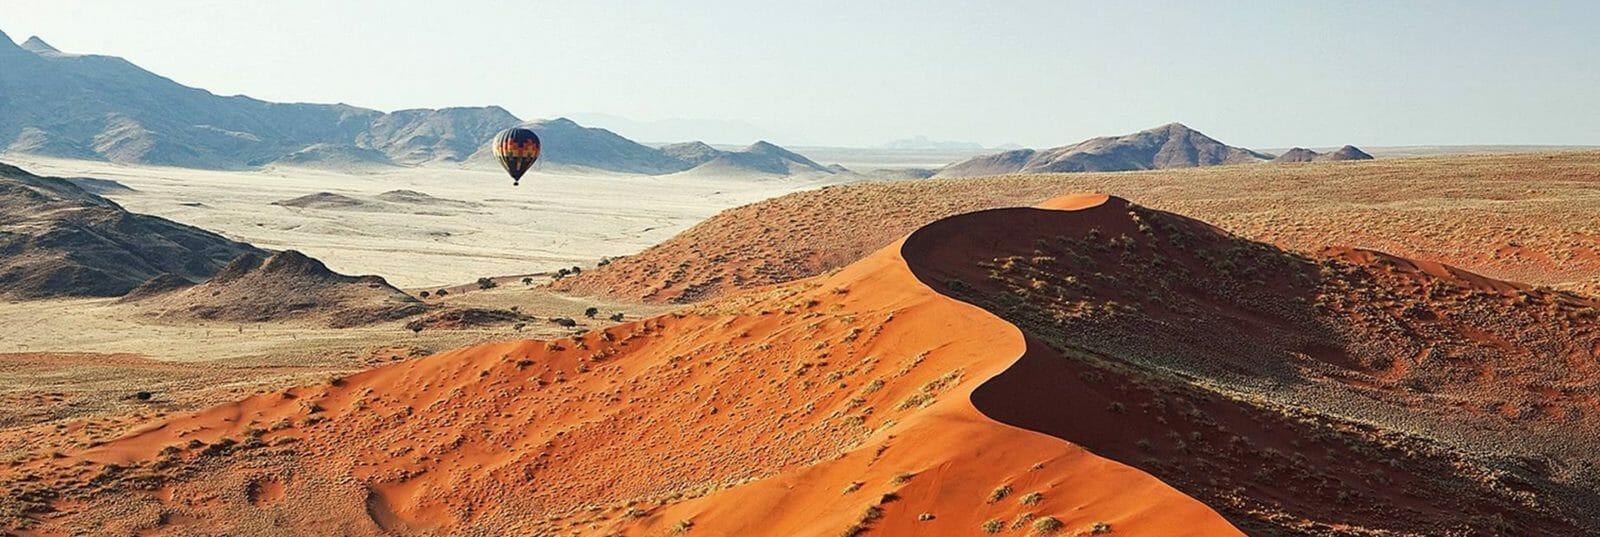 Namib Desert landscape with hot air balloon